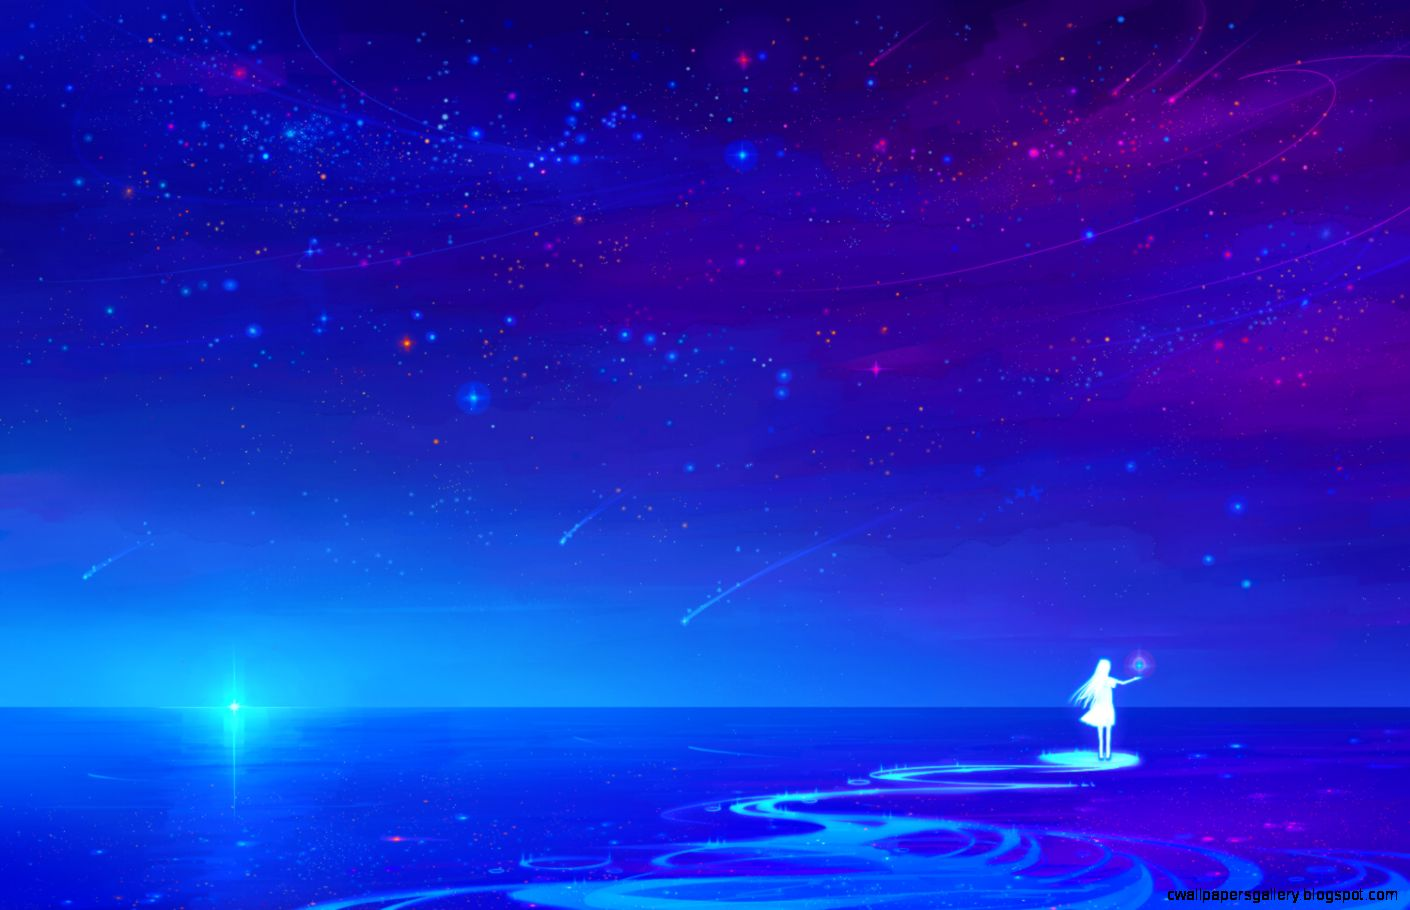 Anime Night Sky Wallpaper  1500x1000  ID51713